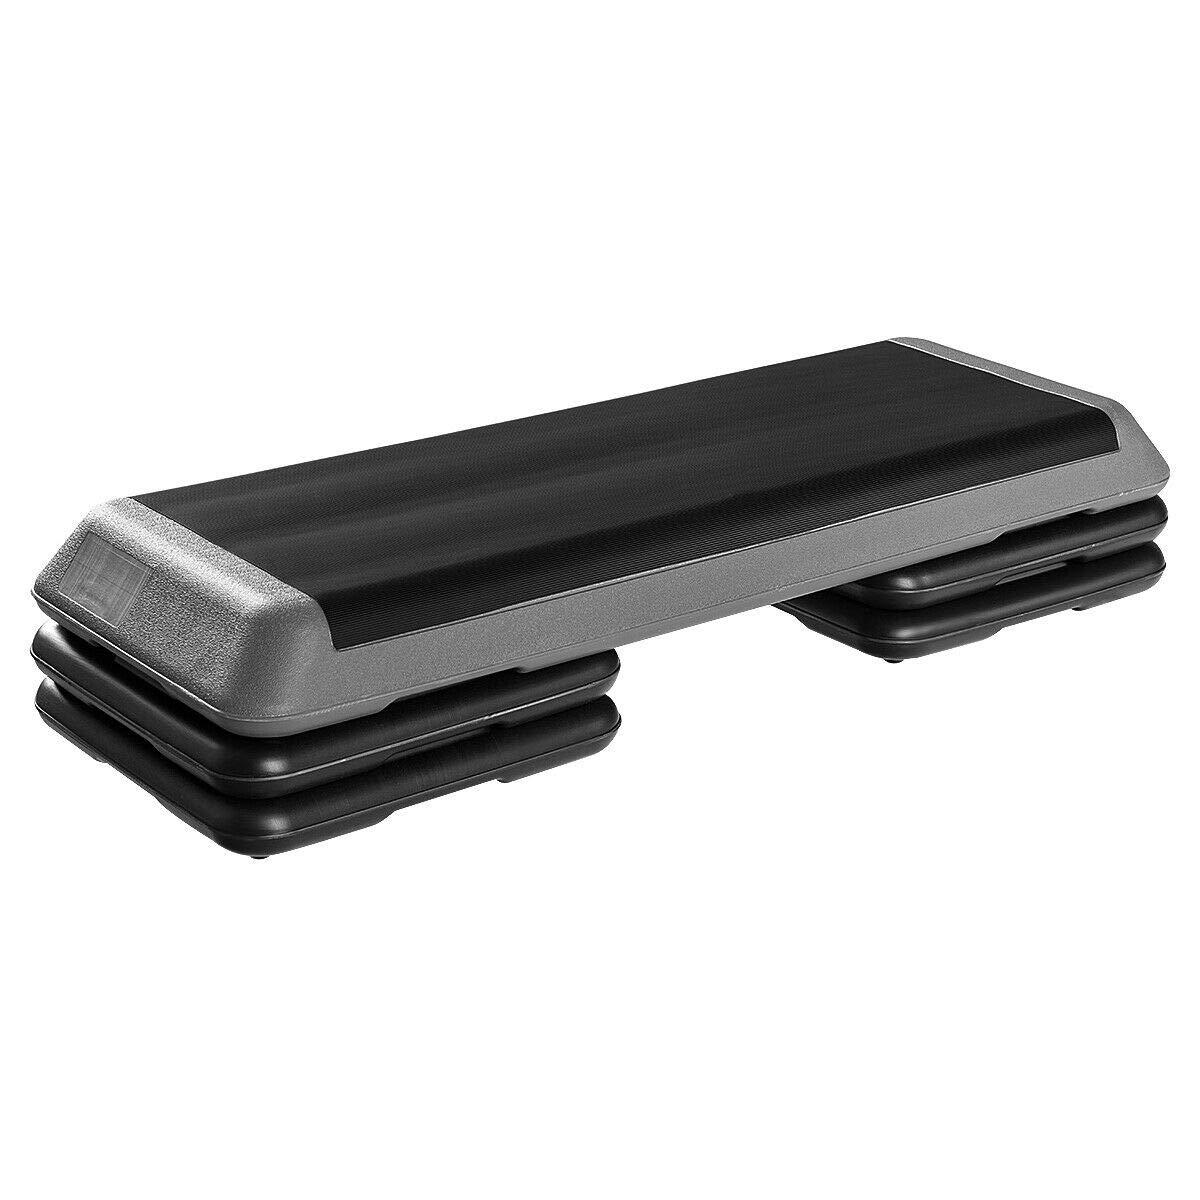 Goplus 43'' Step Platform Adjustable Fitness Aerobic Stepper 4'' - 6'' - 8'' Non-Stick Surface W/Risers (Gray)